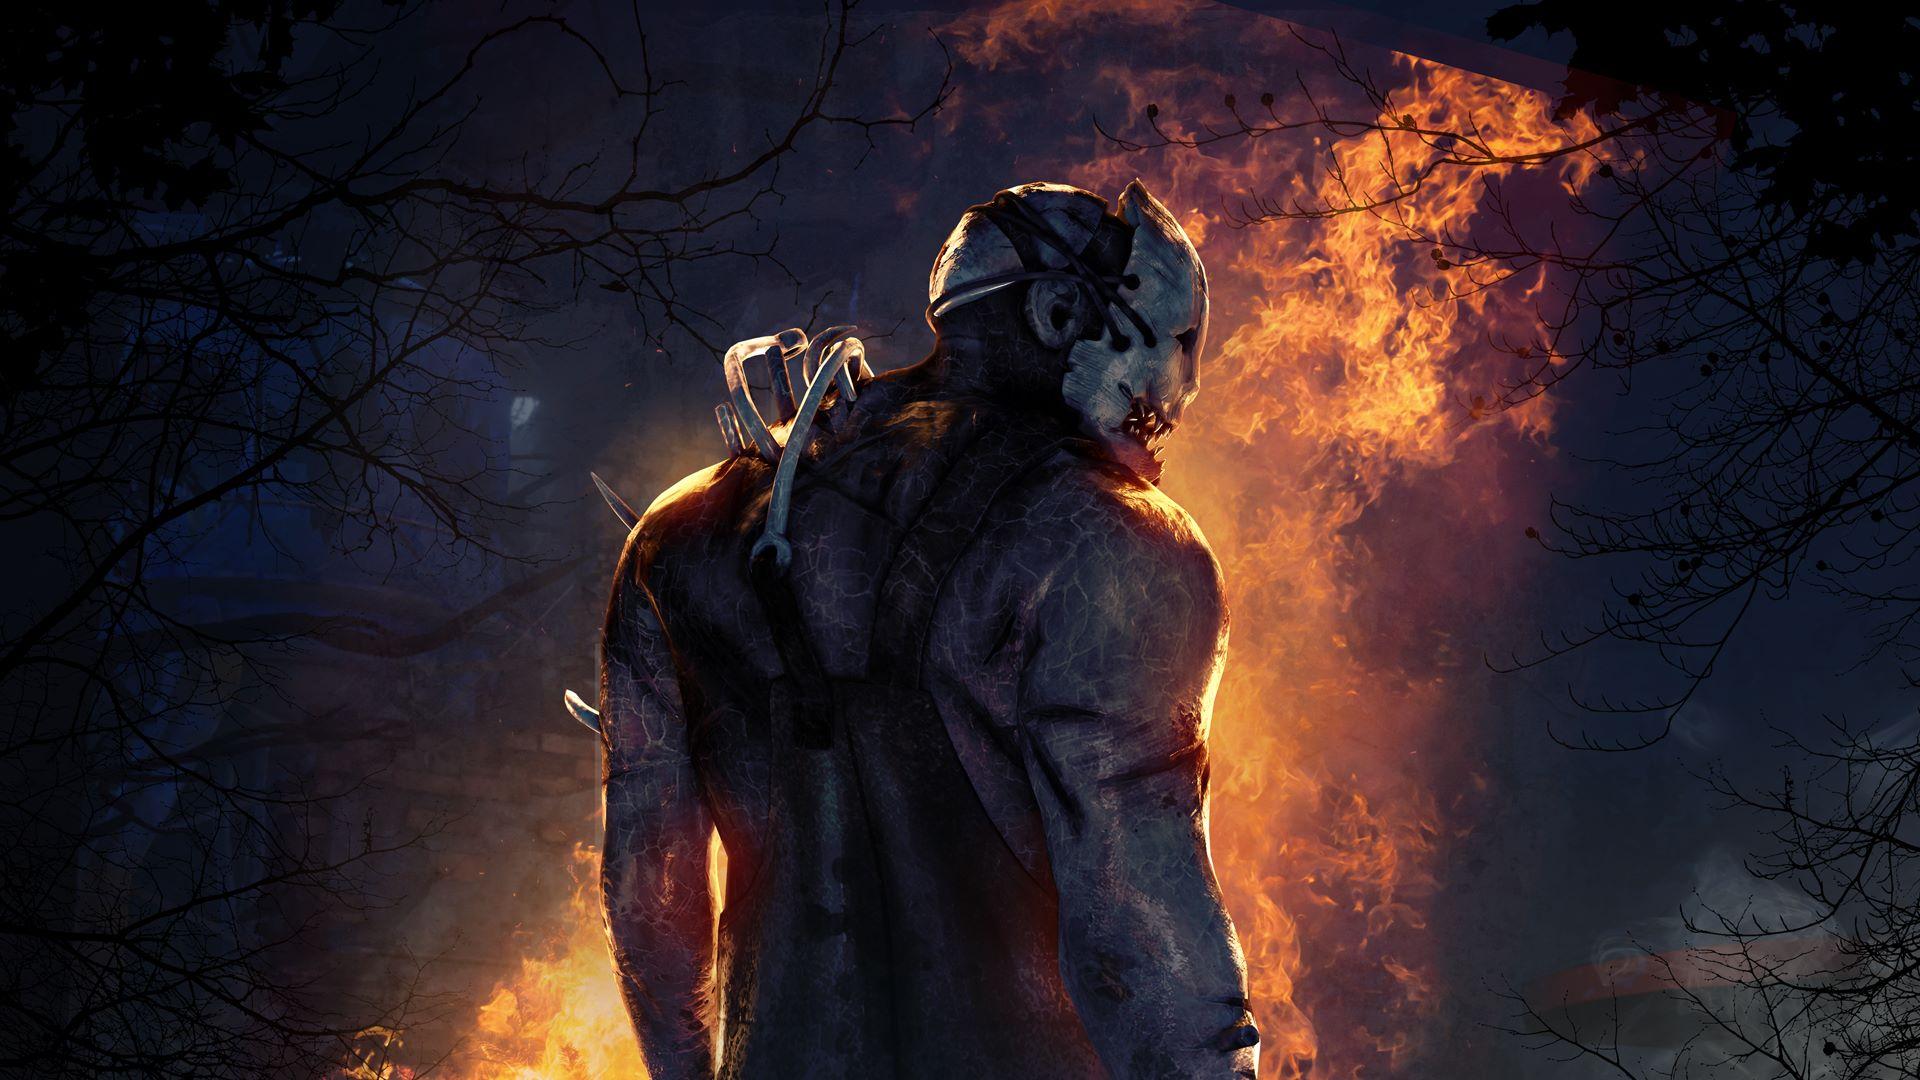 dead-by-daylight-tendra-una-adaptacion-fidedigna-en-switch-frikigamers.com